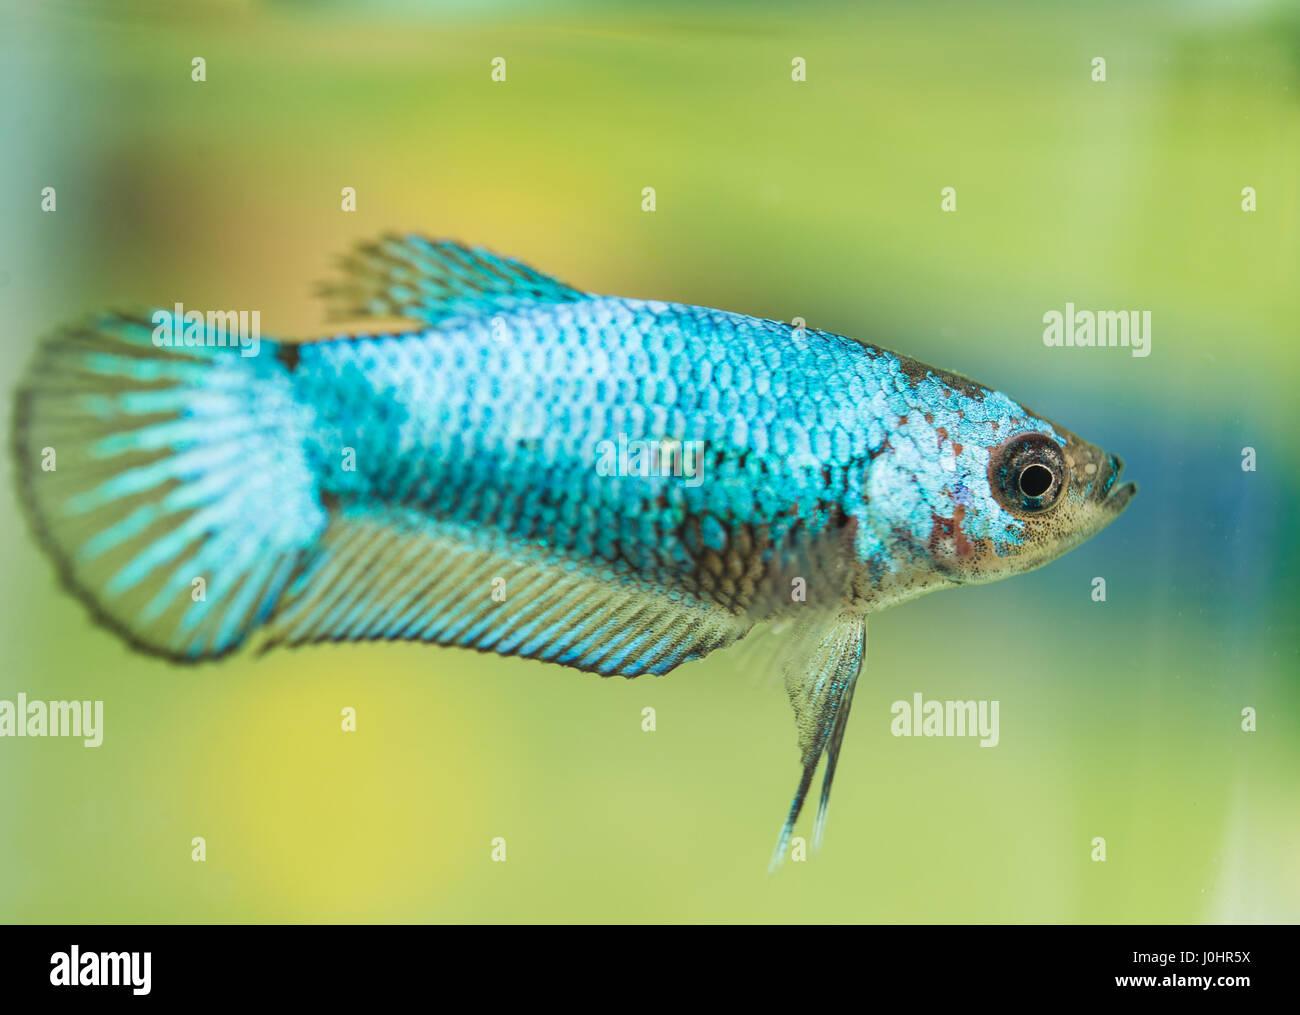 Green female betta splendens Stock Photo: 138074326 - Alamy